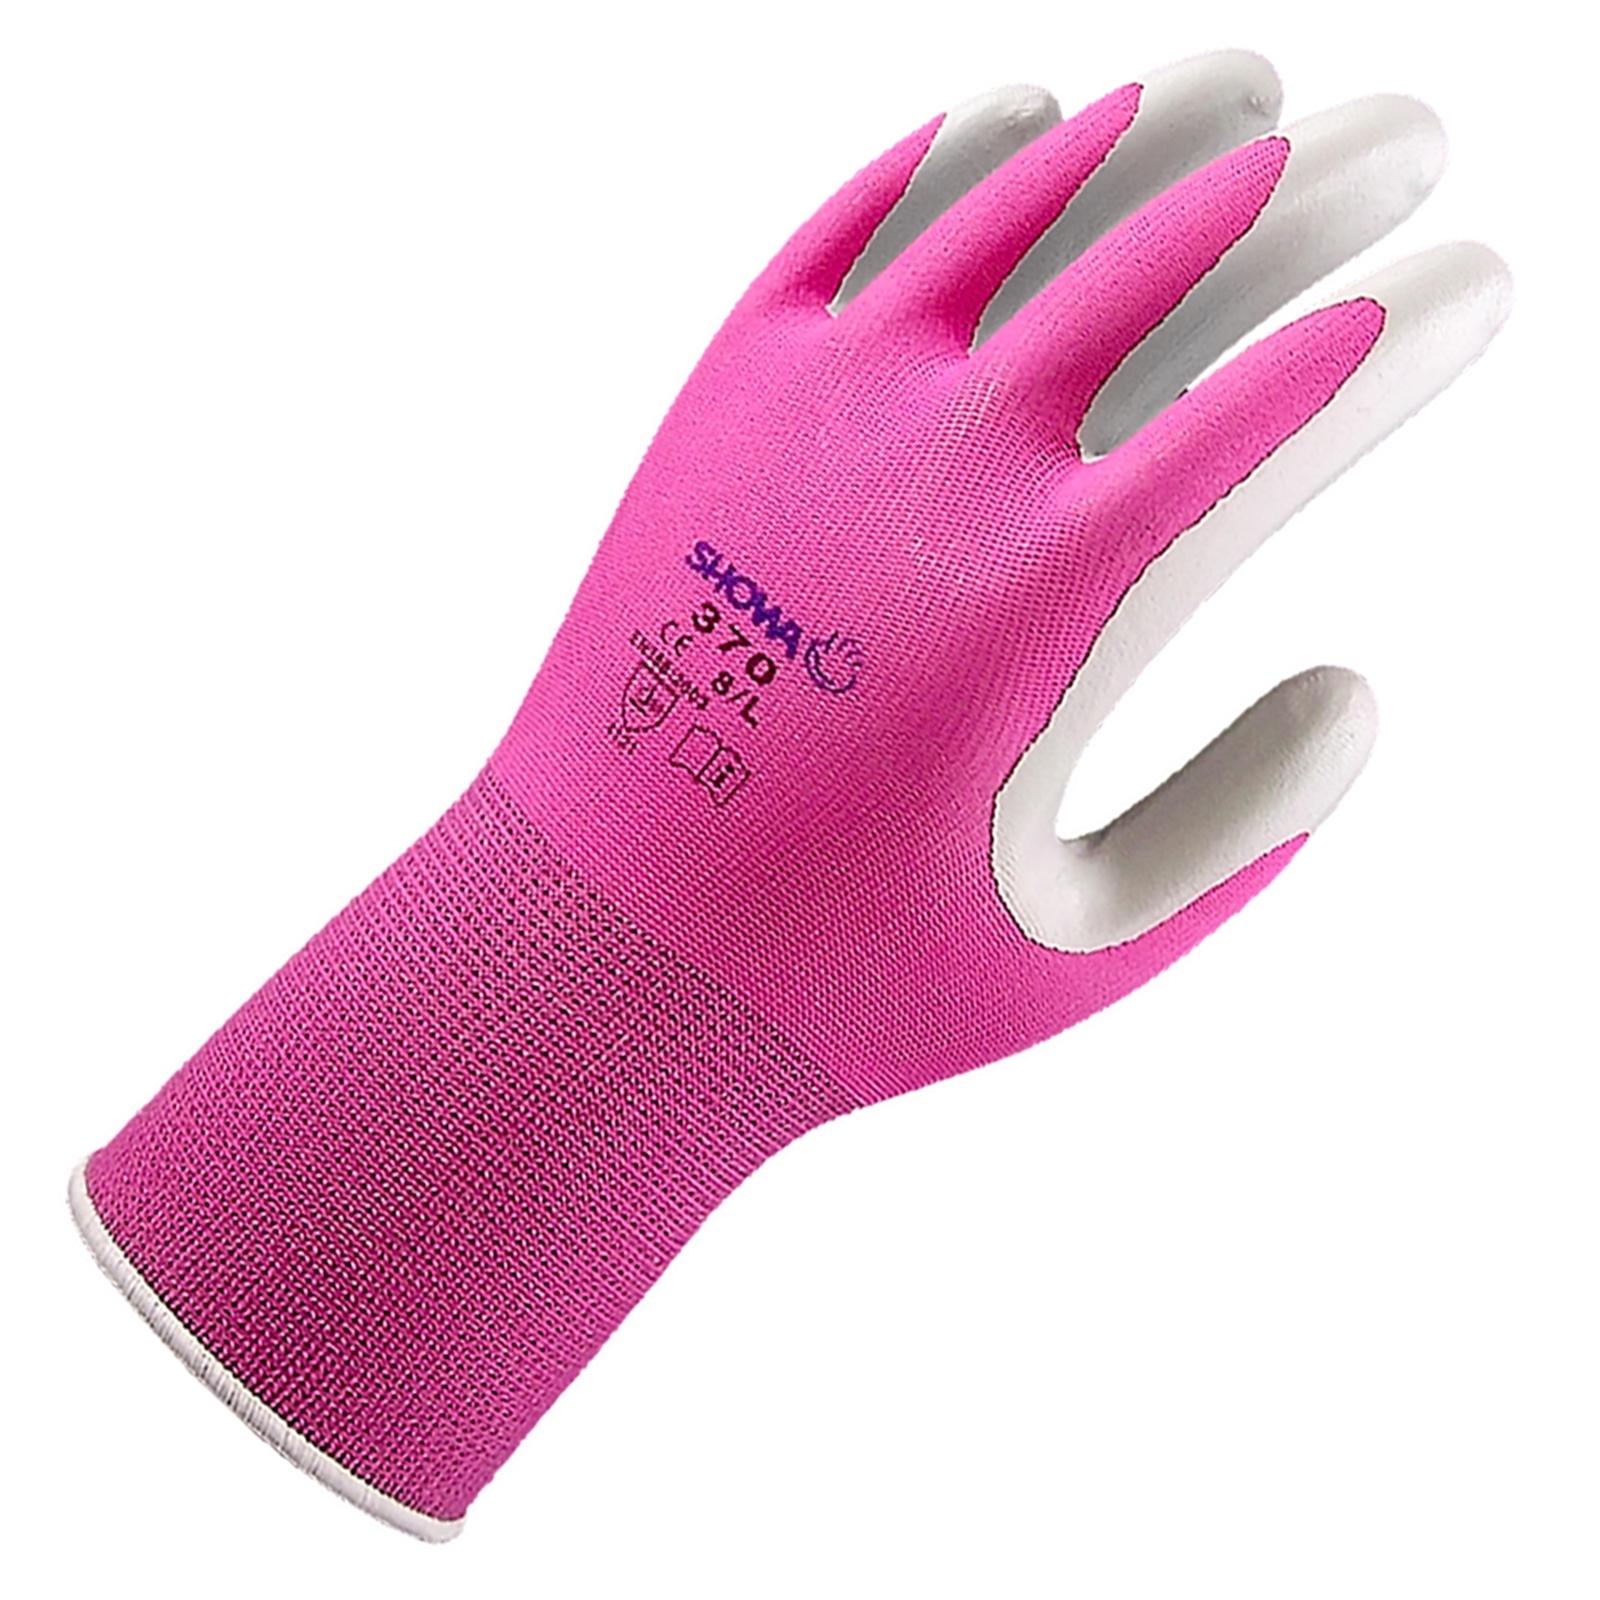 Lynn River Small Multi-Coloured Showa 370 Nitrile Gardening Gloves